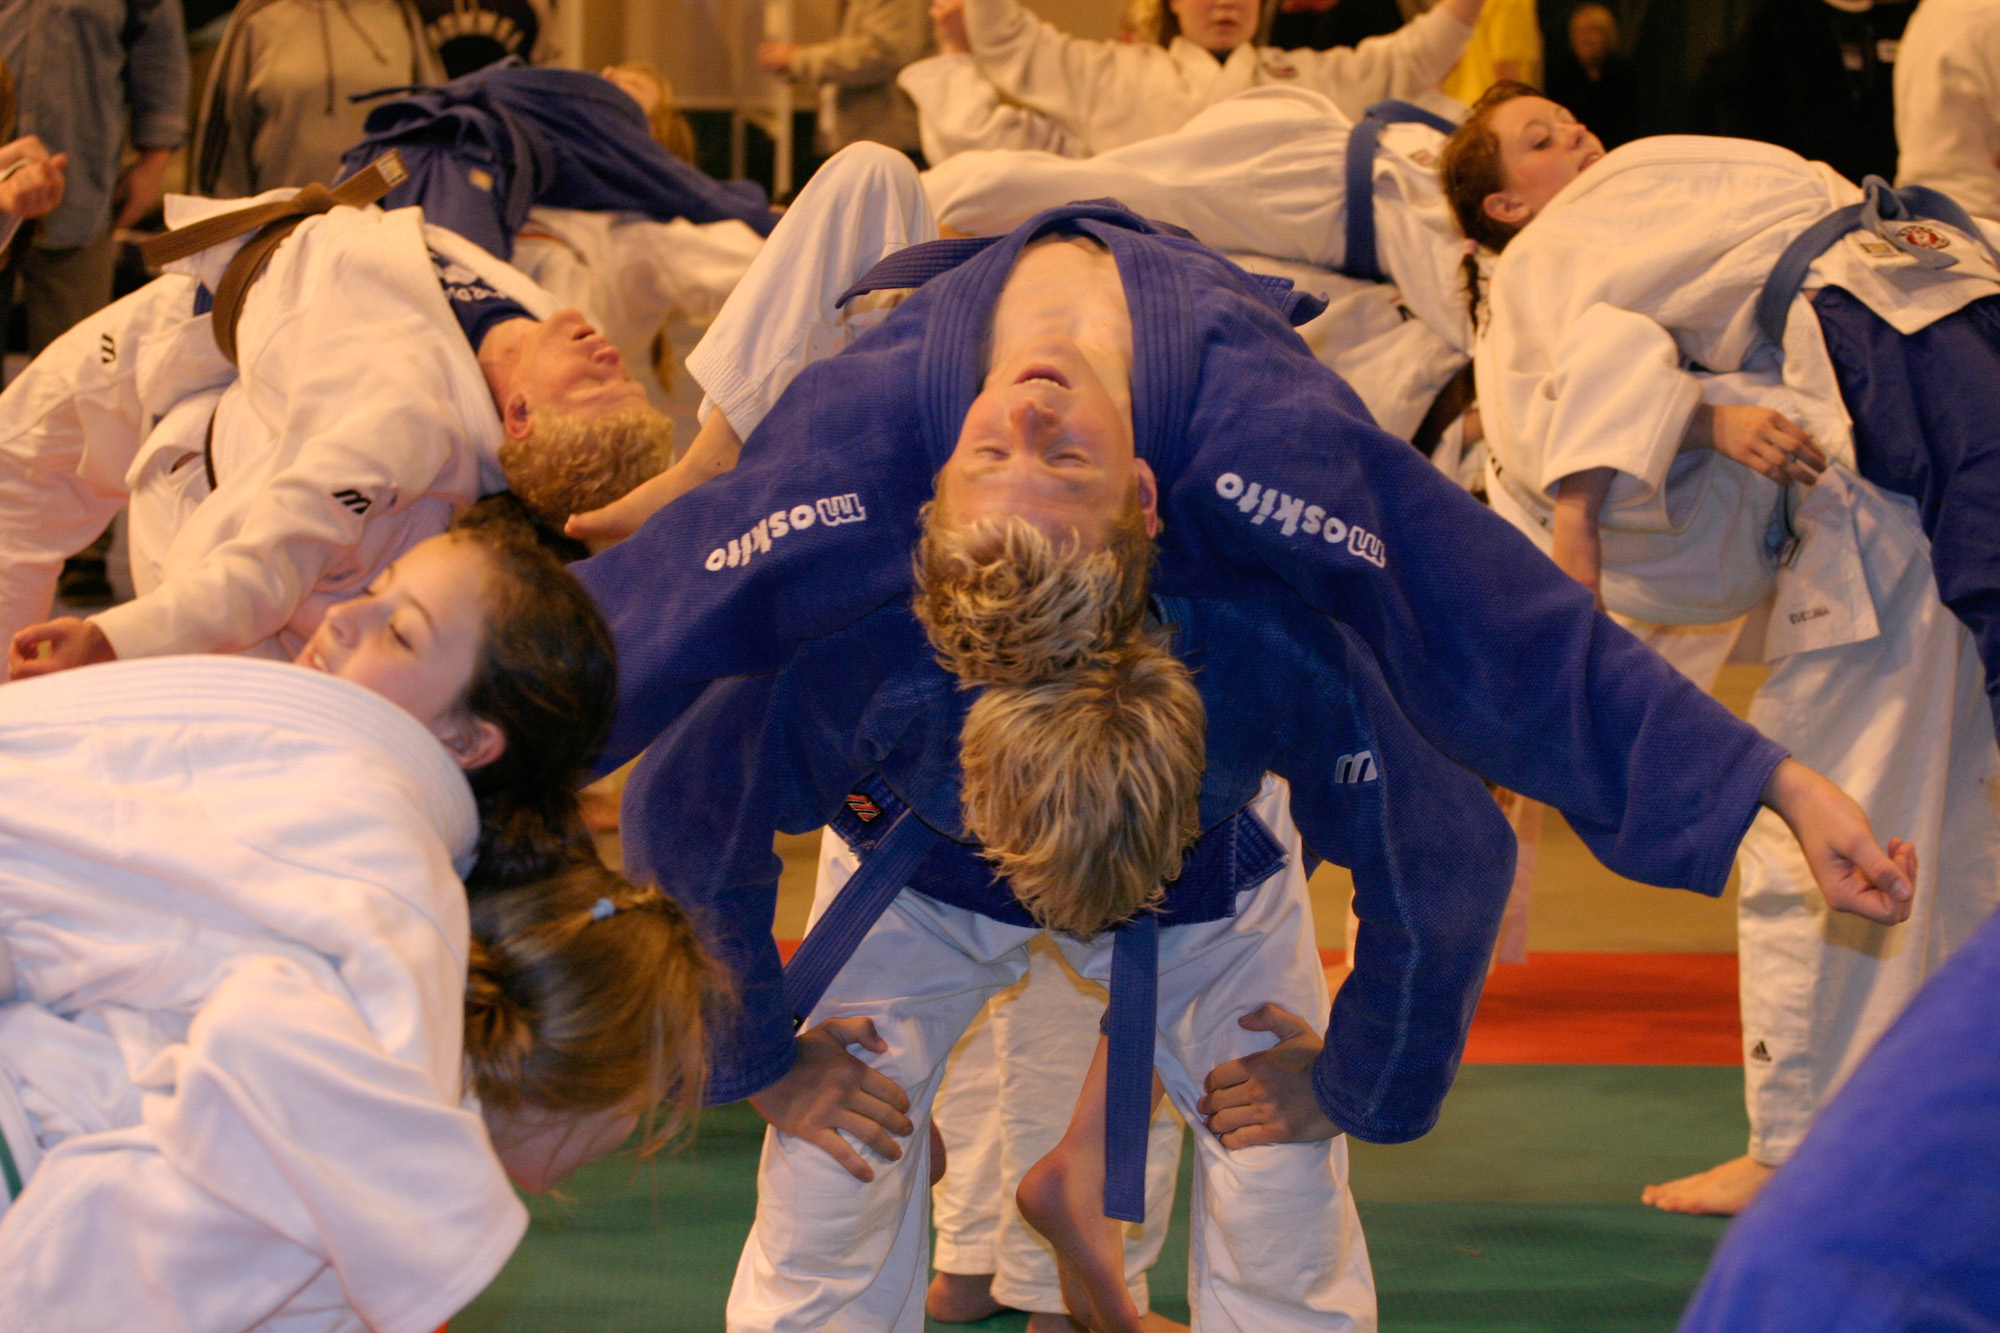 LUGI Judo Camp